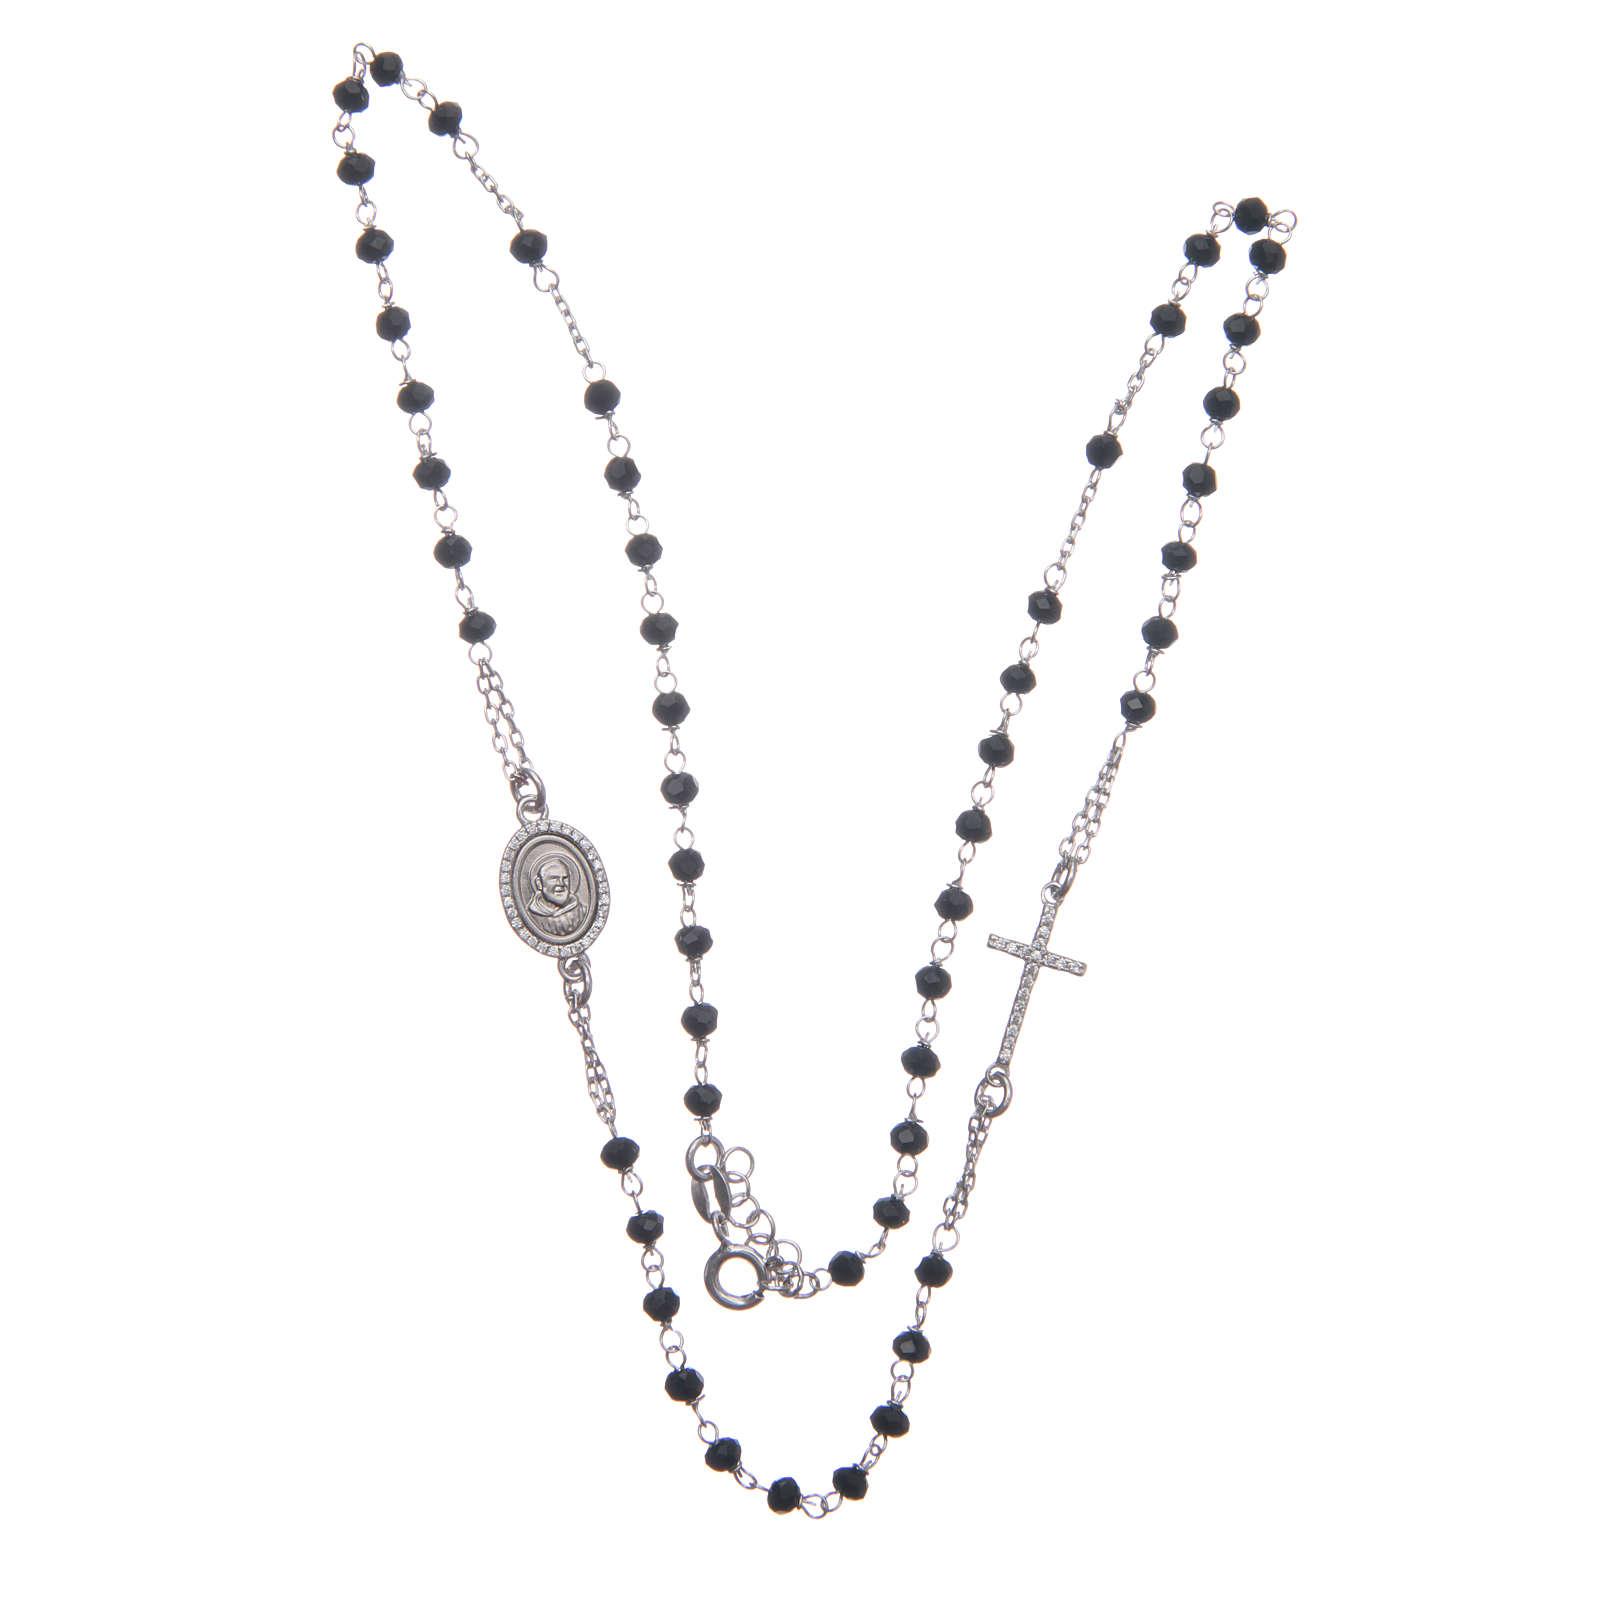 Rosario girocollo Padre Pio nero zirconi bianchi argento 925 4